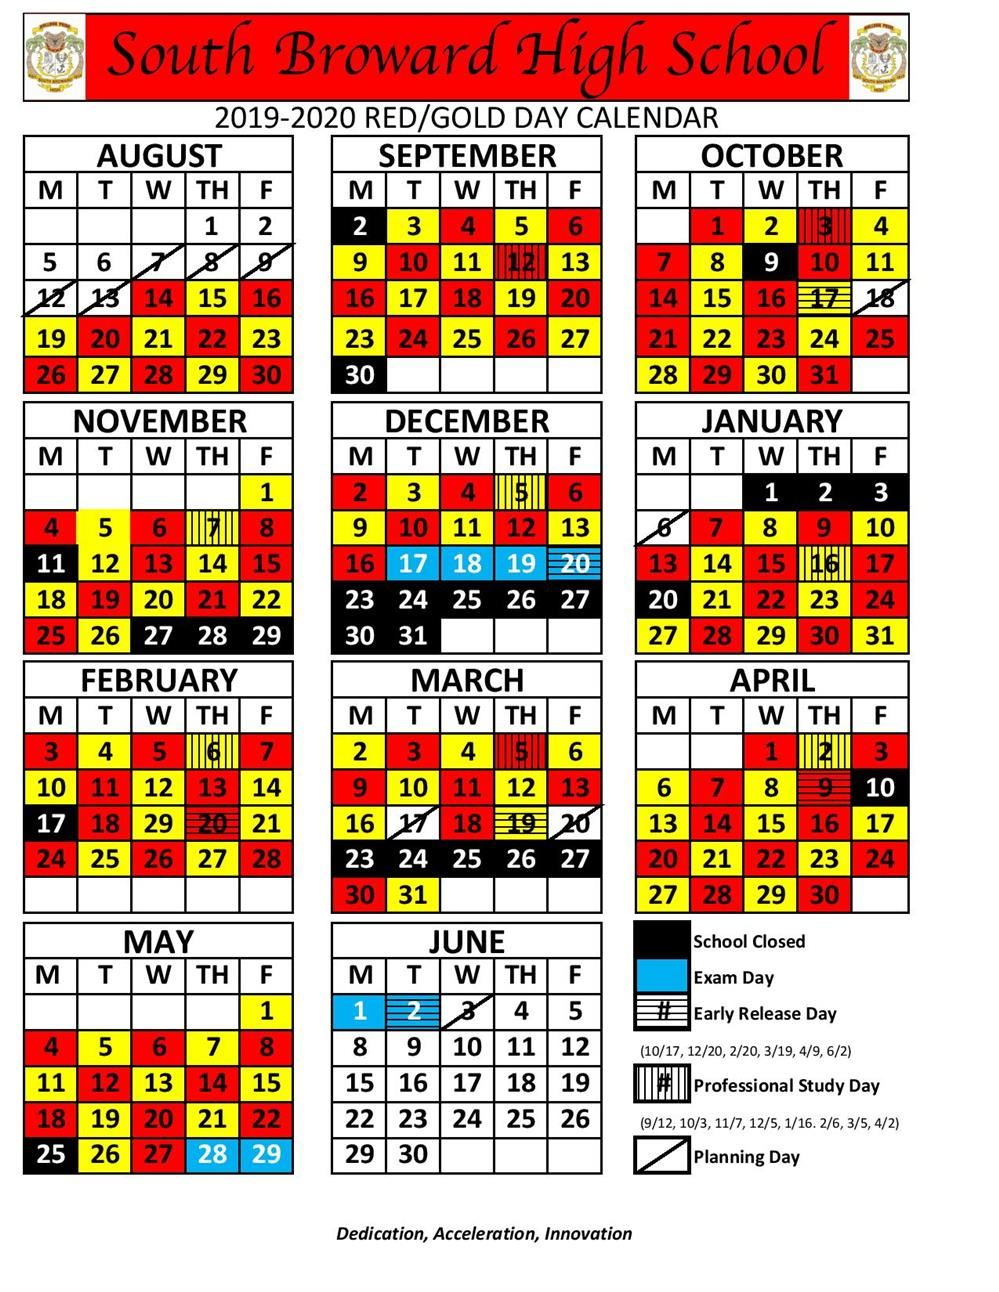 West Palm School Calendar | Printable Calendar 2020-2021